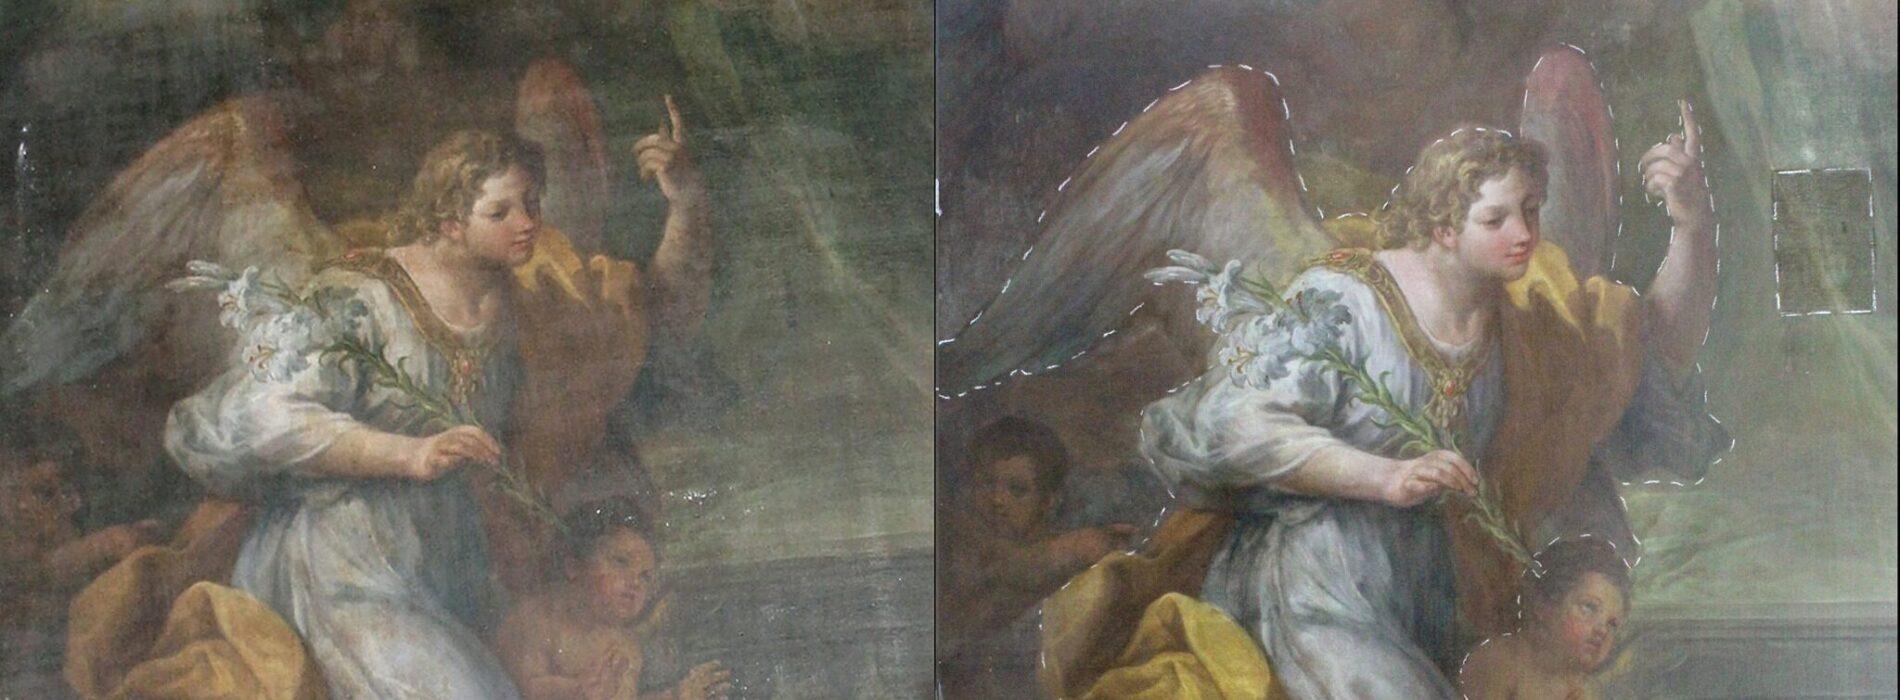 "C'è Intesa, ""restituita"" l'Annunciazione di Sebastiano Conca"